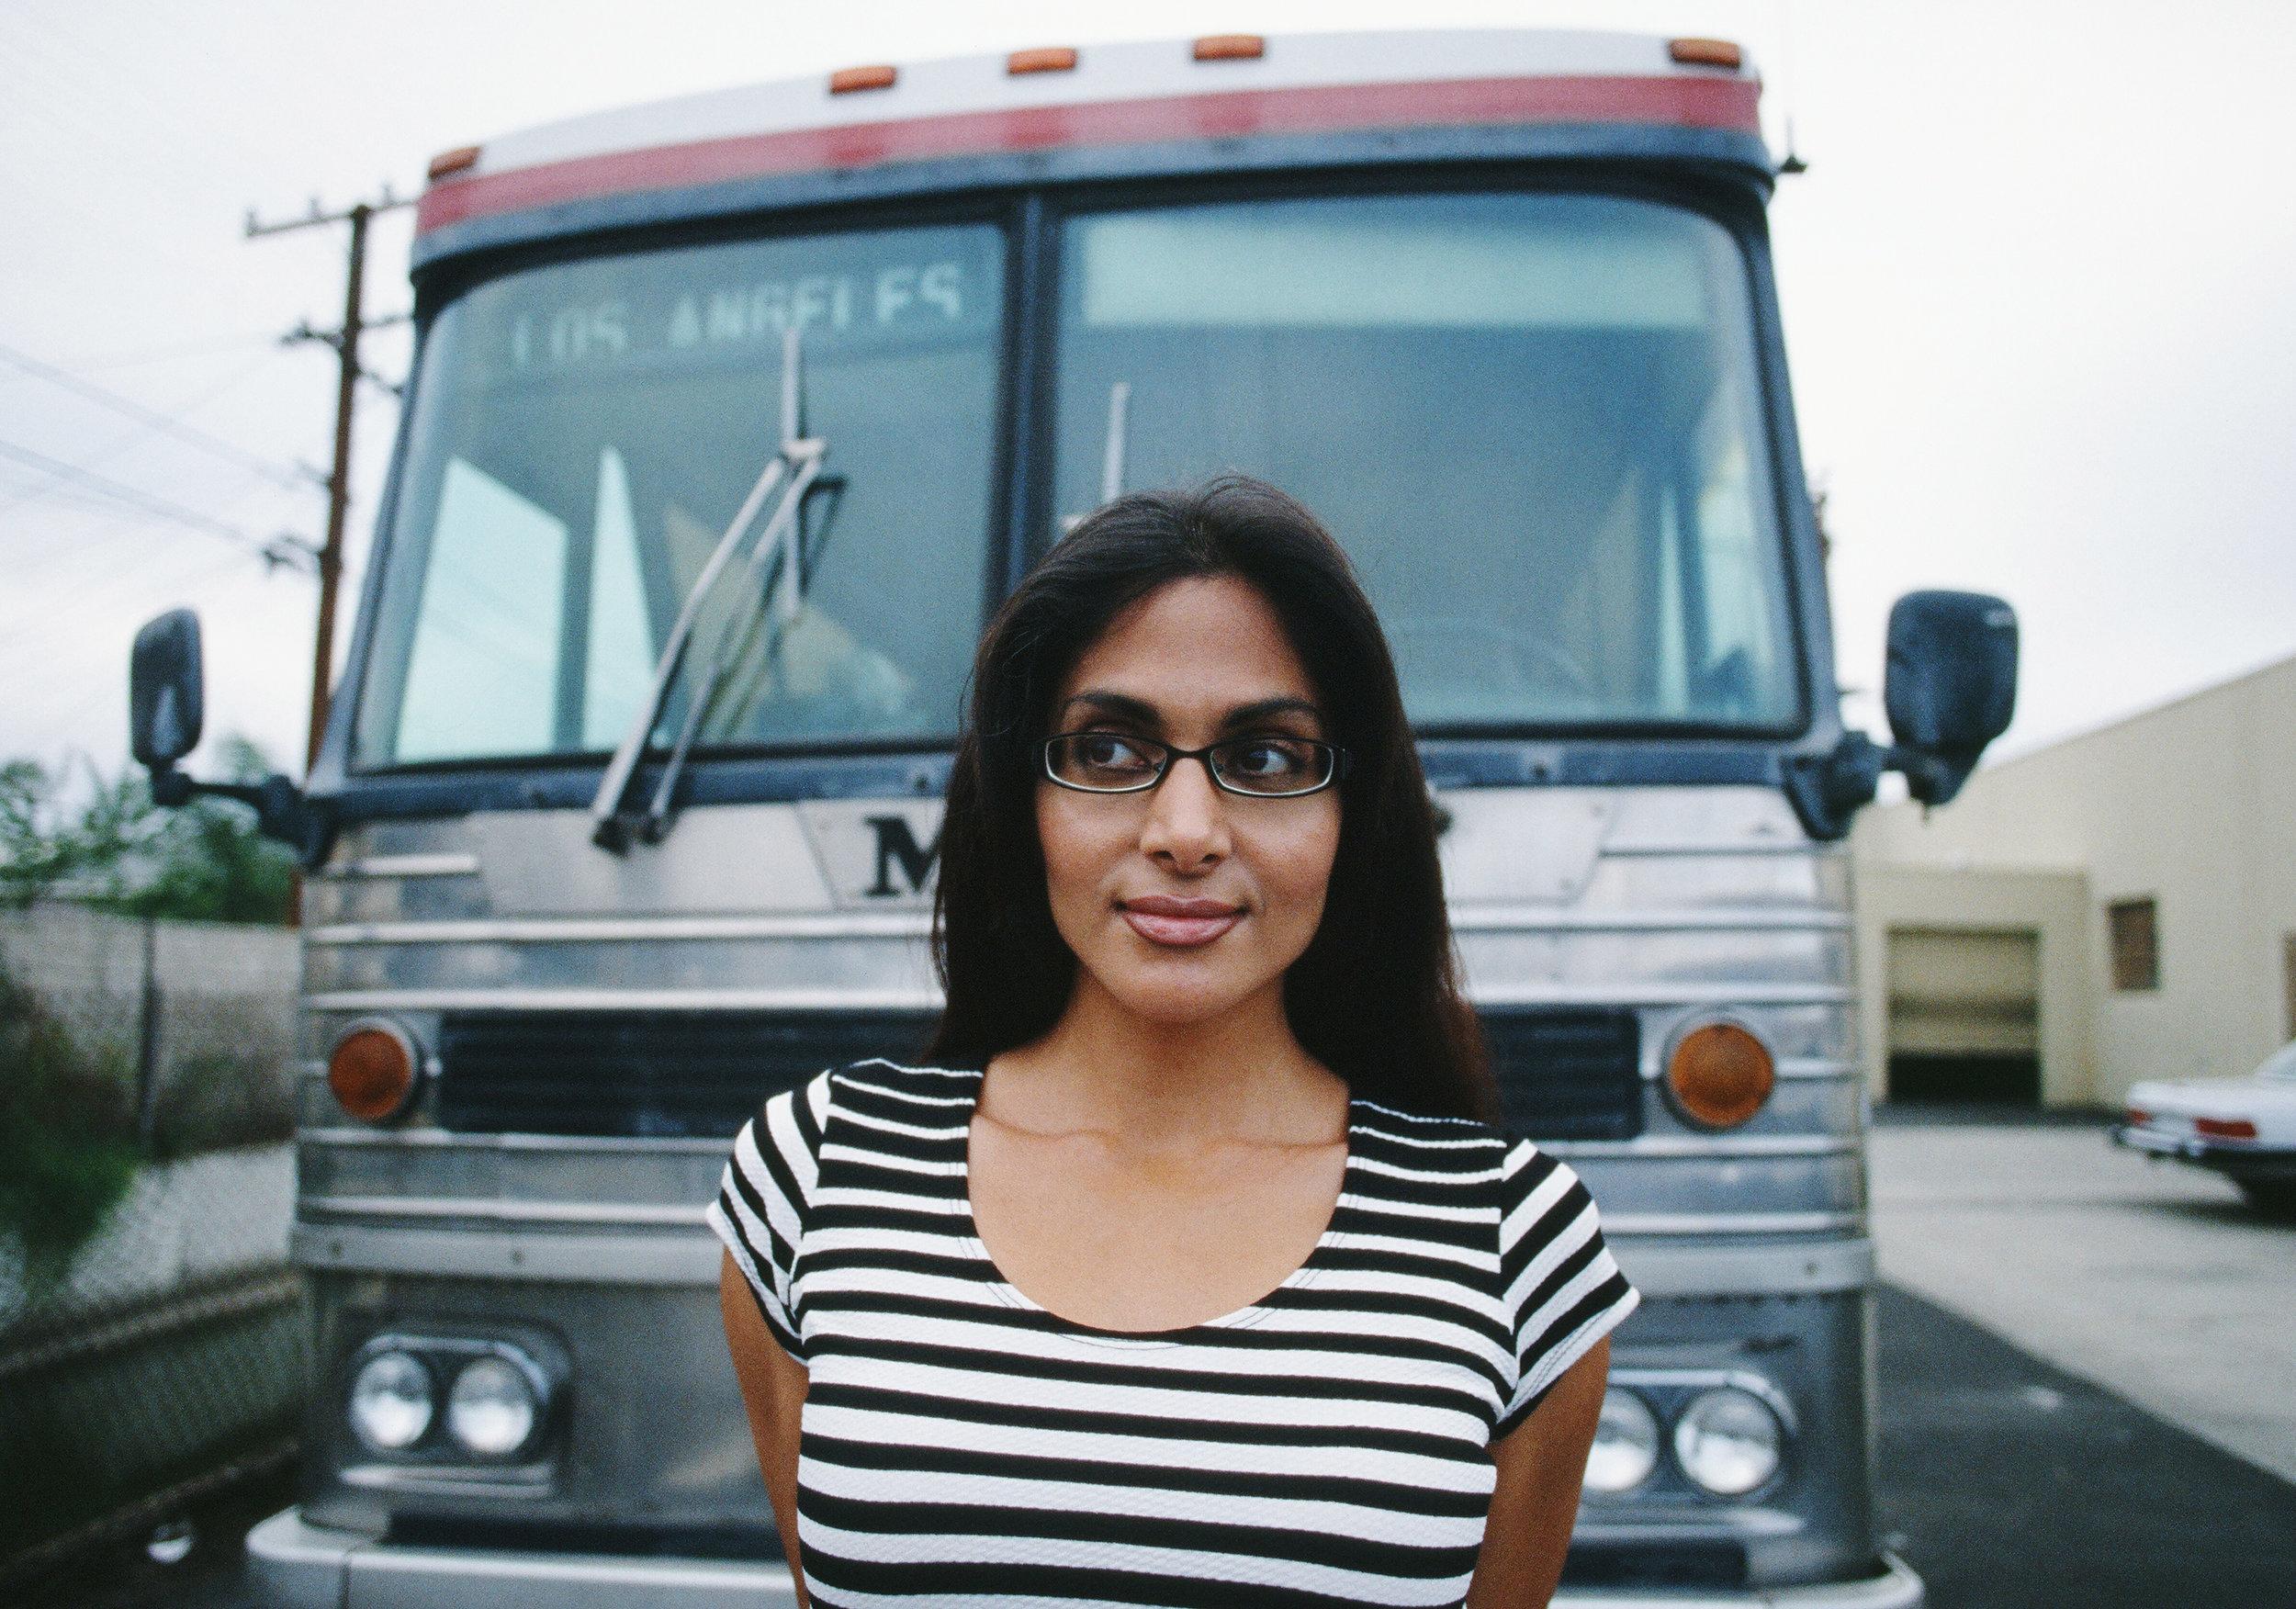 Adriane_Film_LA_Bus_01.jpg